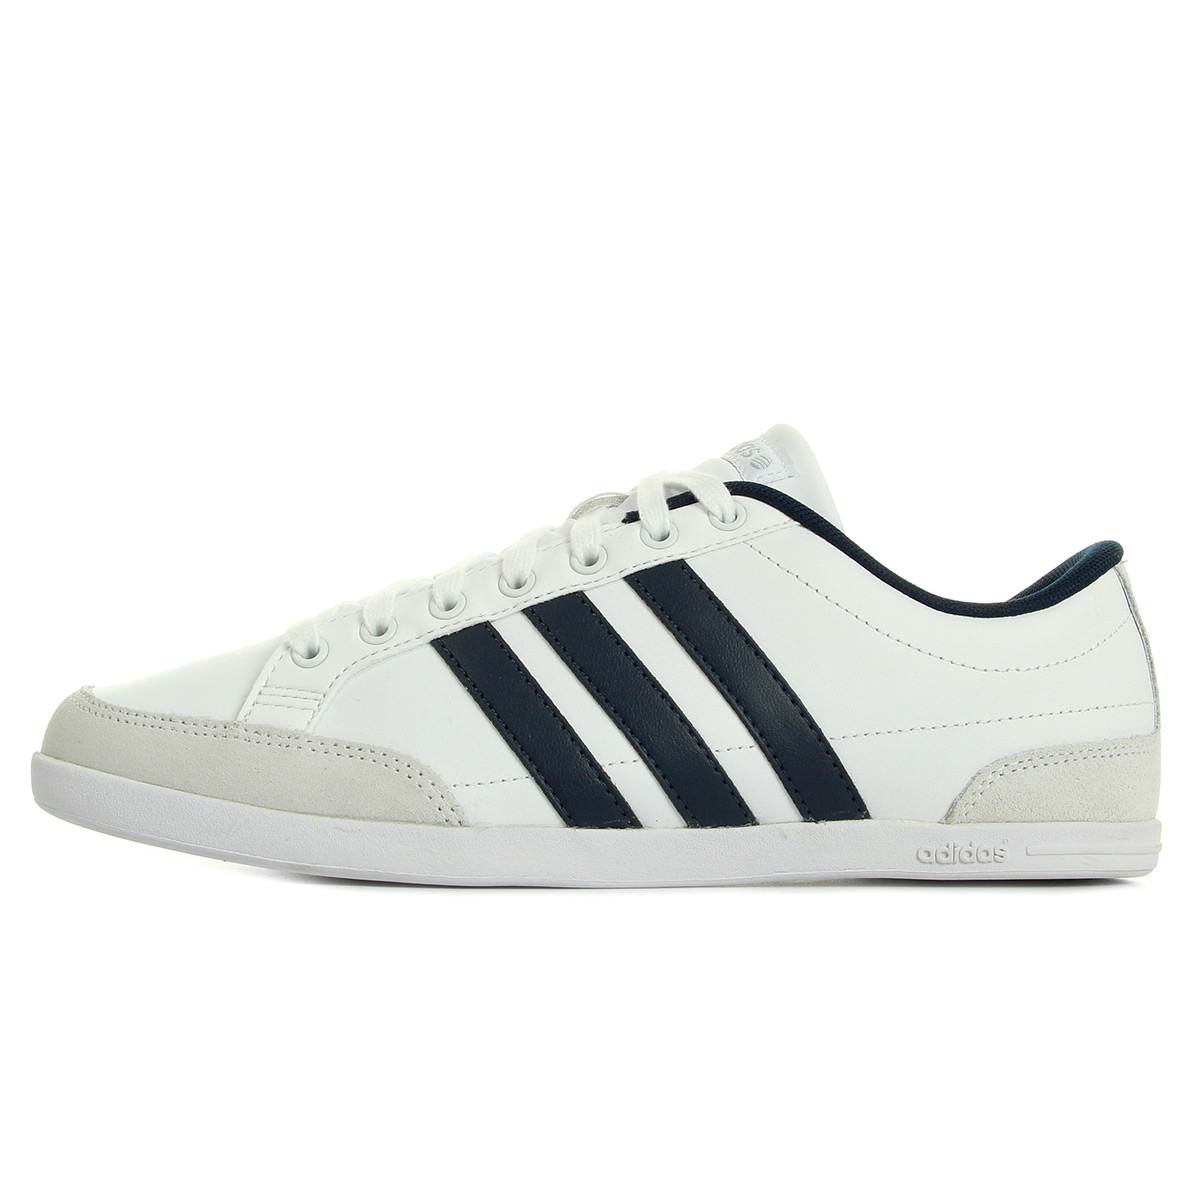 Adidas Neo Caflaire White